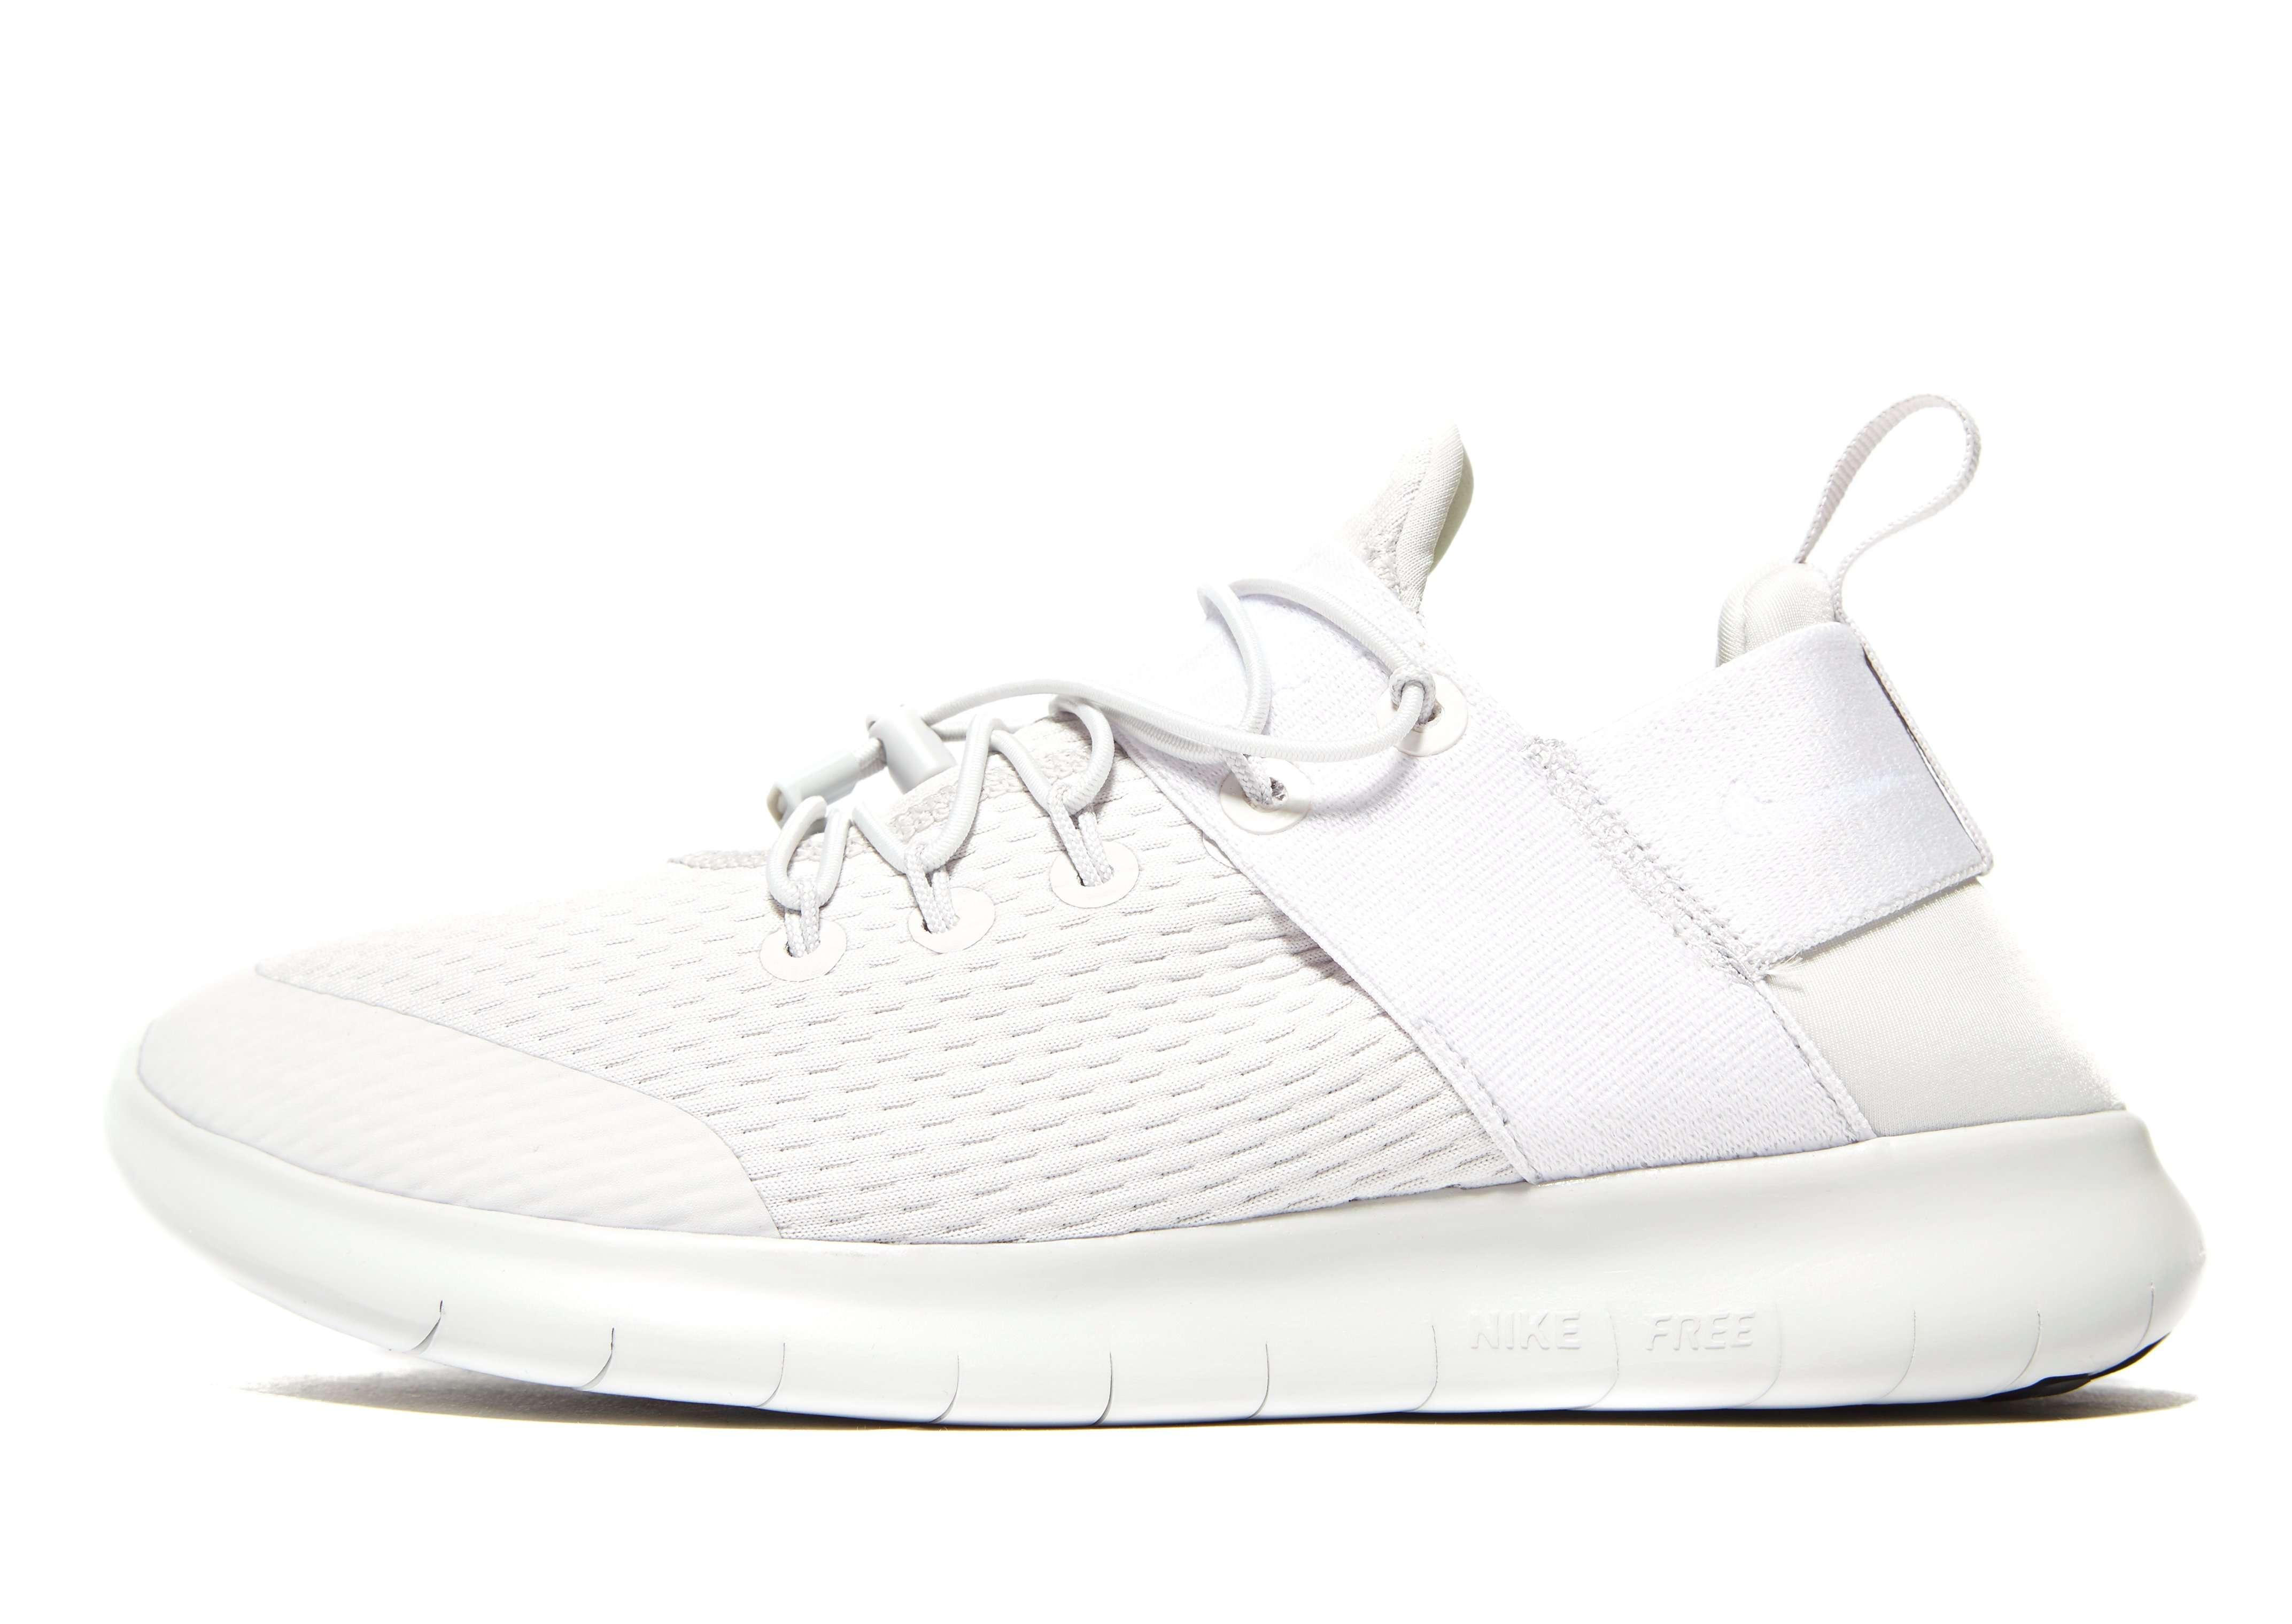 Nike Free RN Commuter 2 - Women's Running Shoes - White 021444